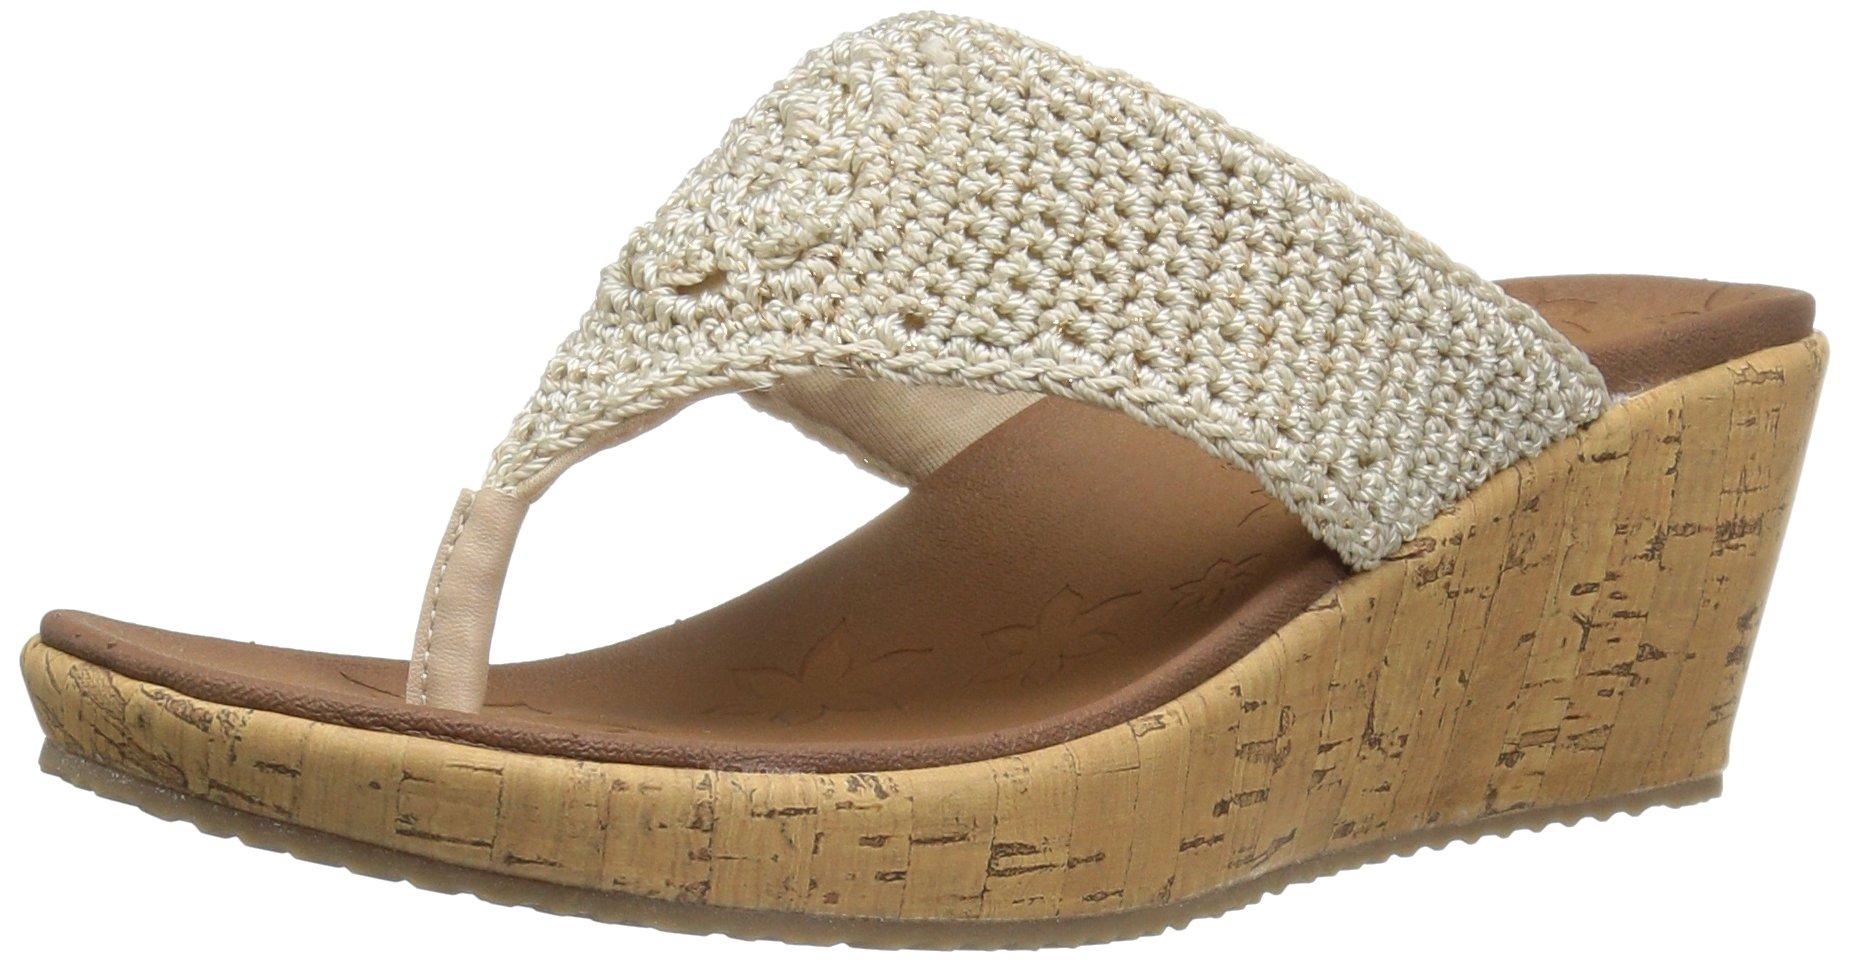 Skechers Cali Women's Beverlee Wedge Sandal,Natural Crochet,9 M US